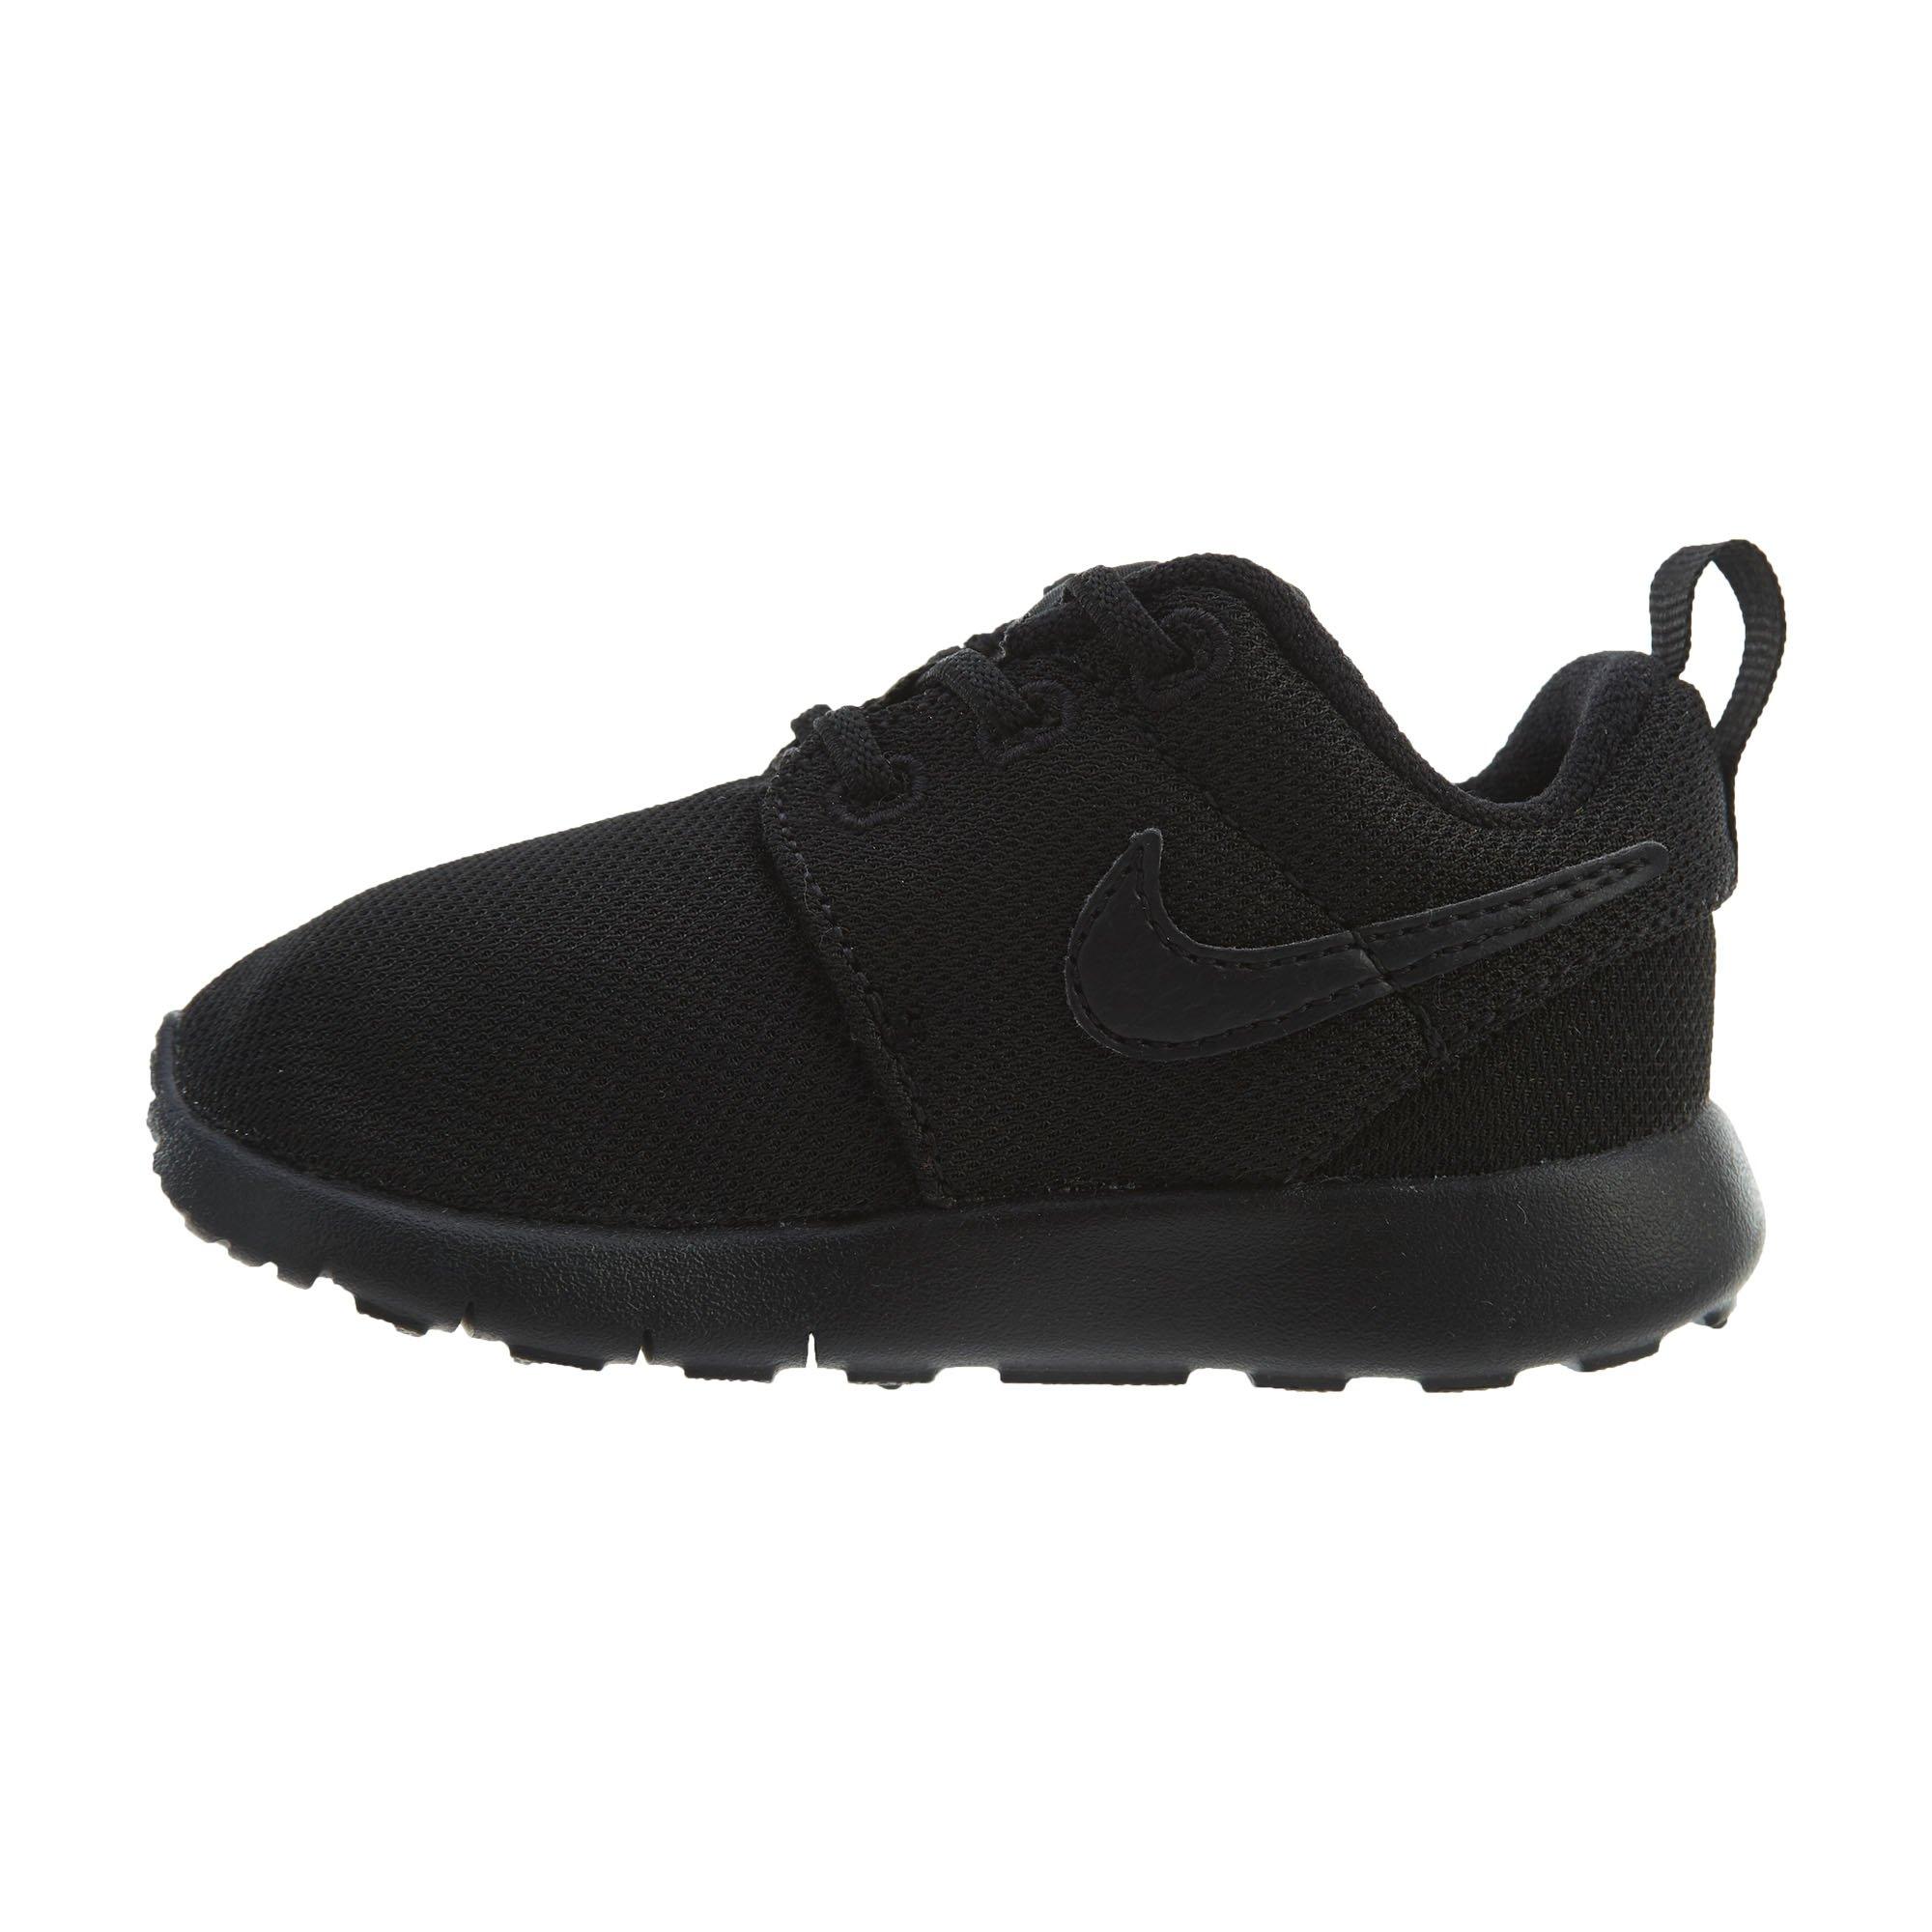 Nike Toddlers' Roshe One (TDV) Black Fabric Running Shoe 6 by Nike (Image #4)